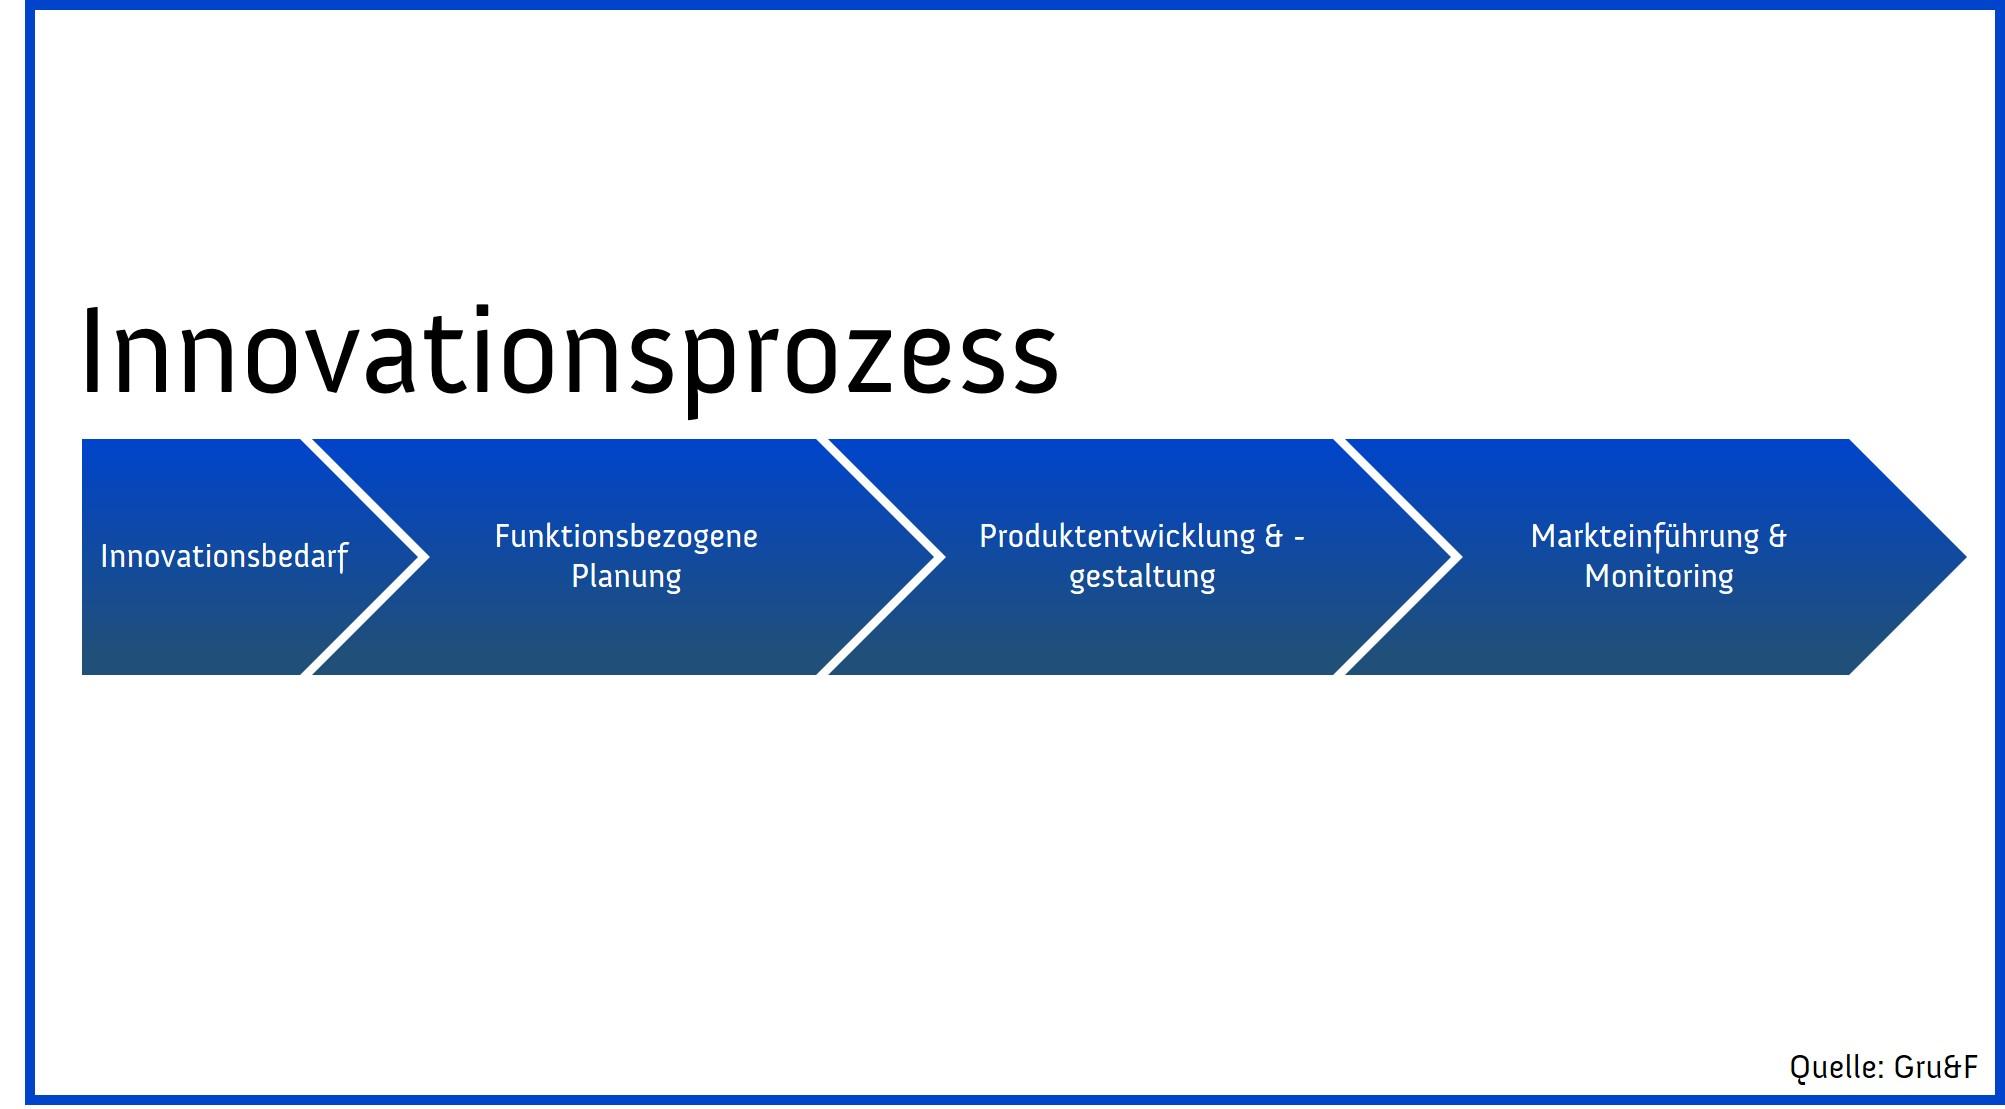 Gru&F gruf Innovationsprozess Grafik